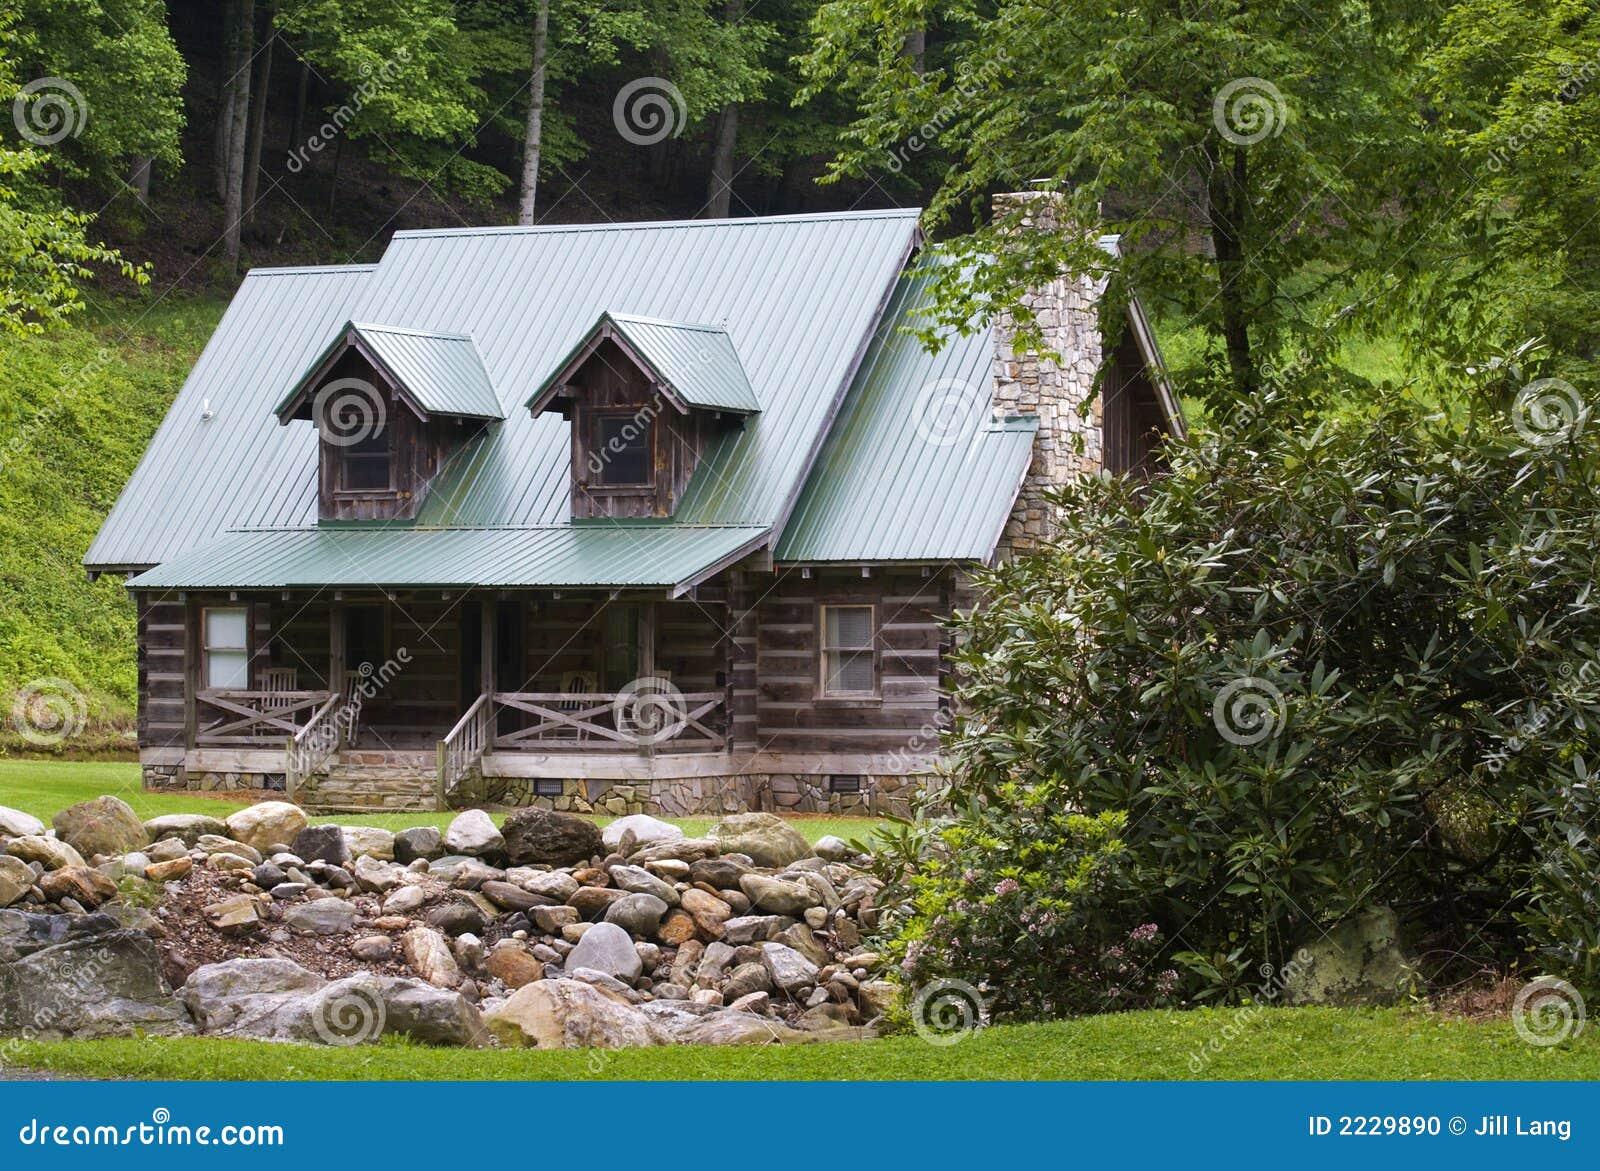 Mountain Log Cabin Stock Photo Image 2229890